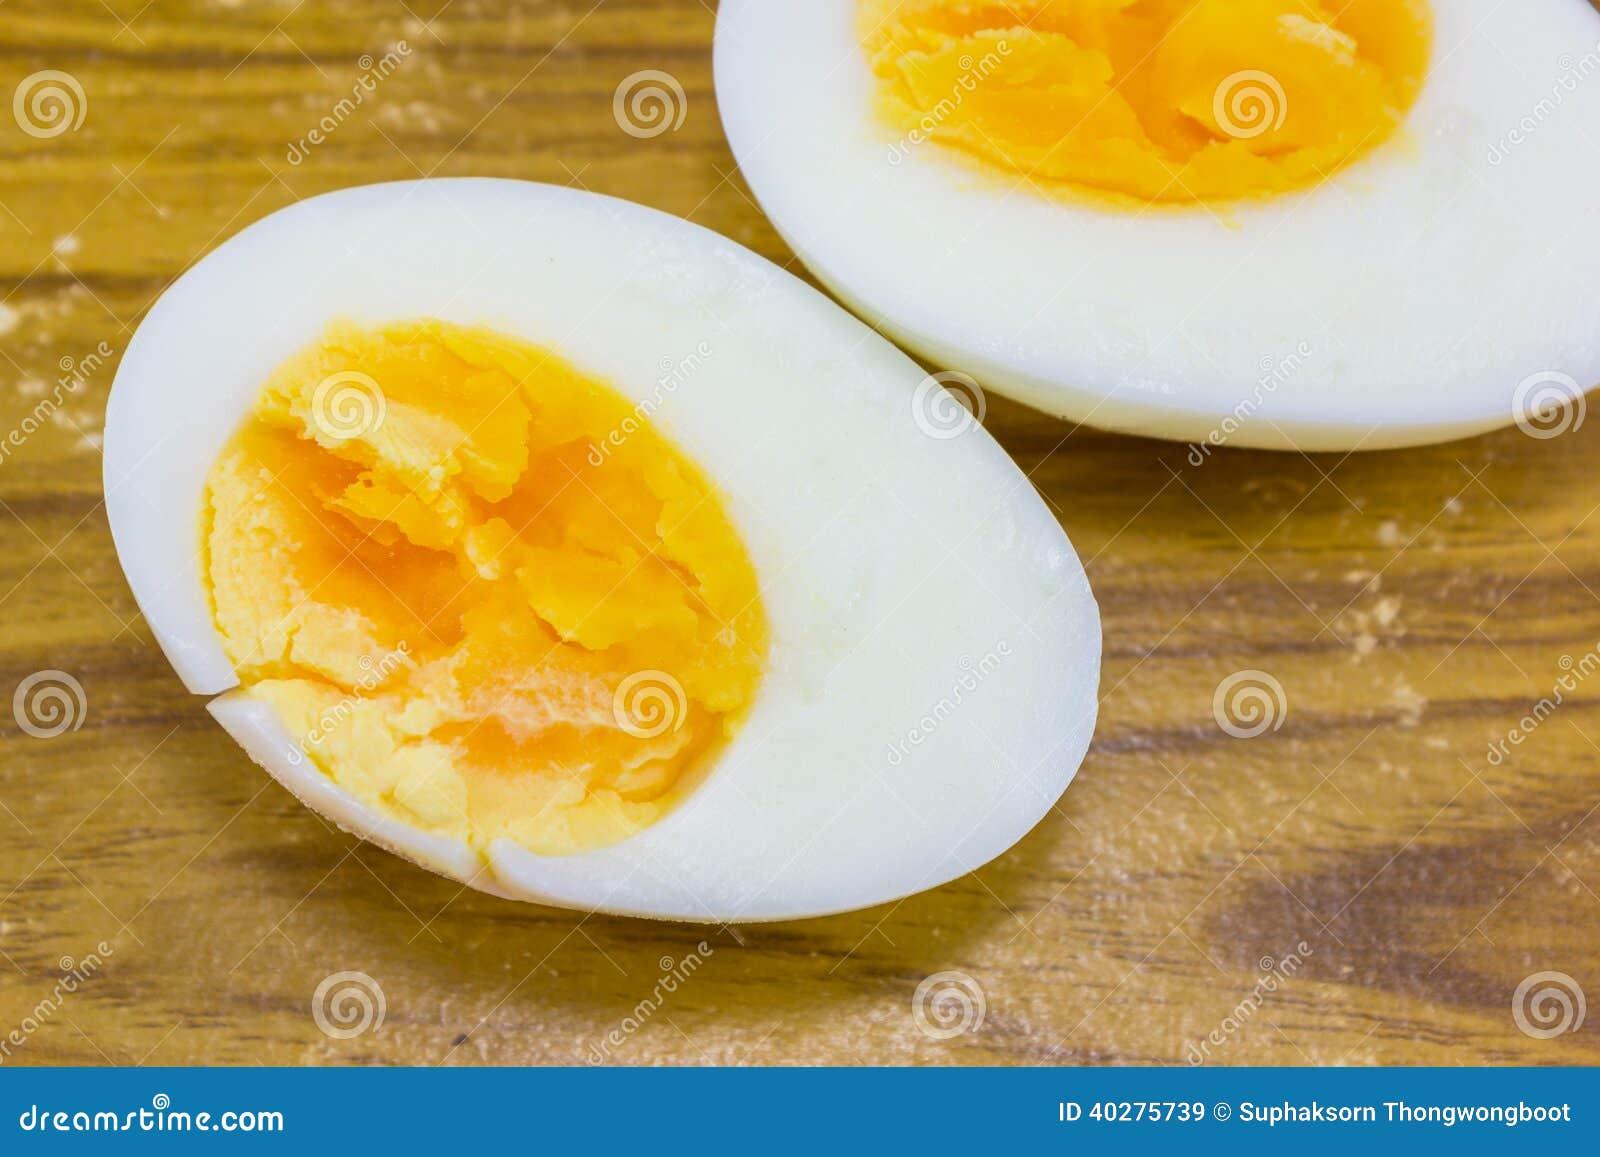 2 половины вареного яйца